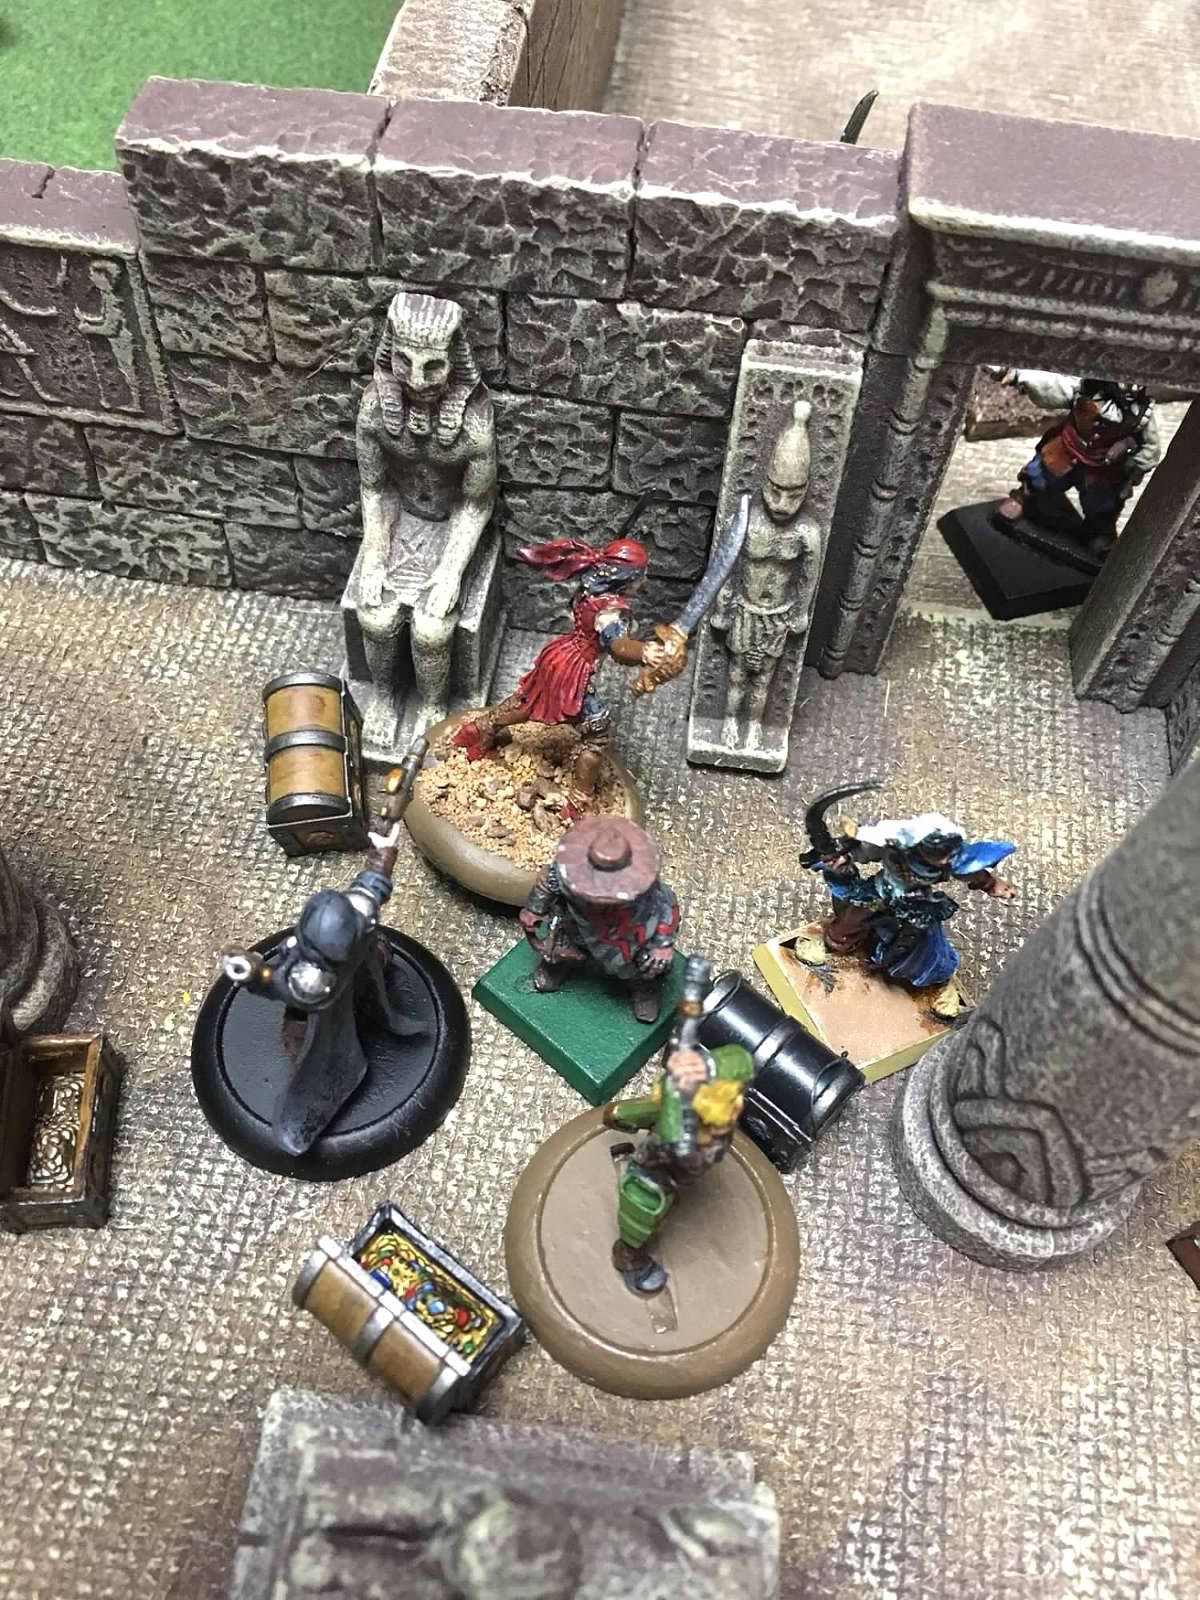 Pyrates of the Karribean VI.a--Dead Man's Hand - Page 7 47a8d602b3127cce98549f18e42d00000010100AbOXDRkzbMmWA